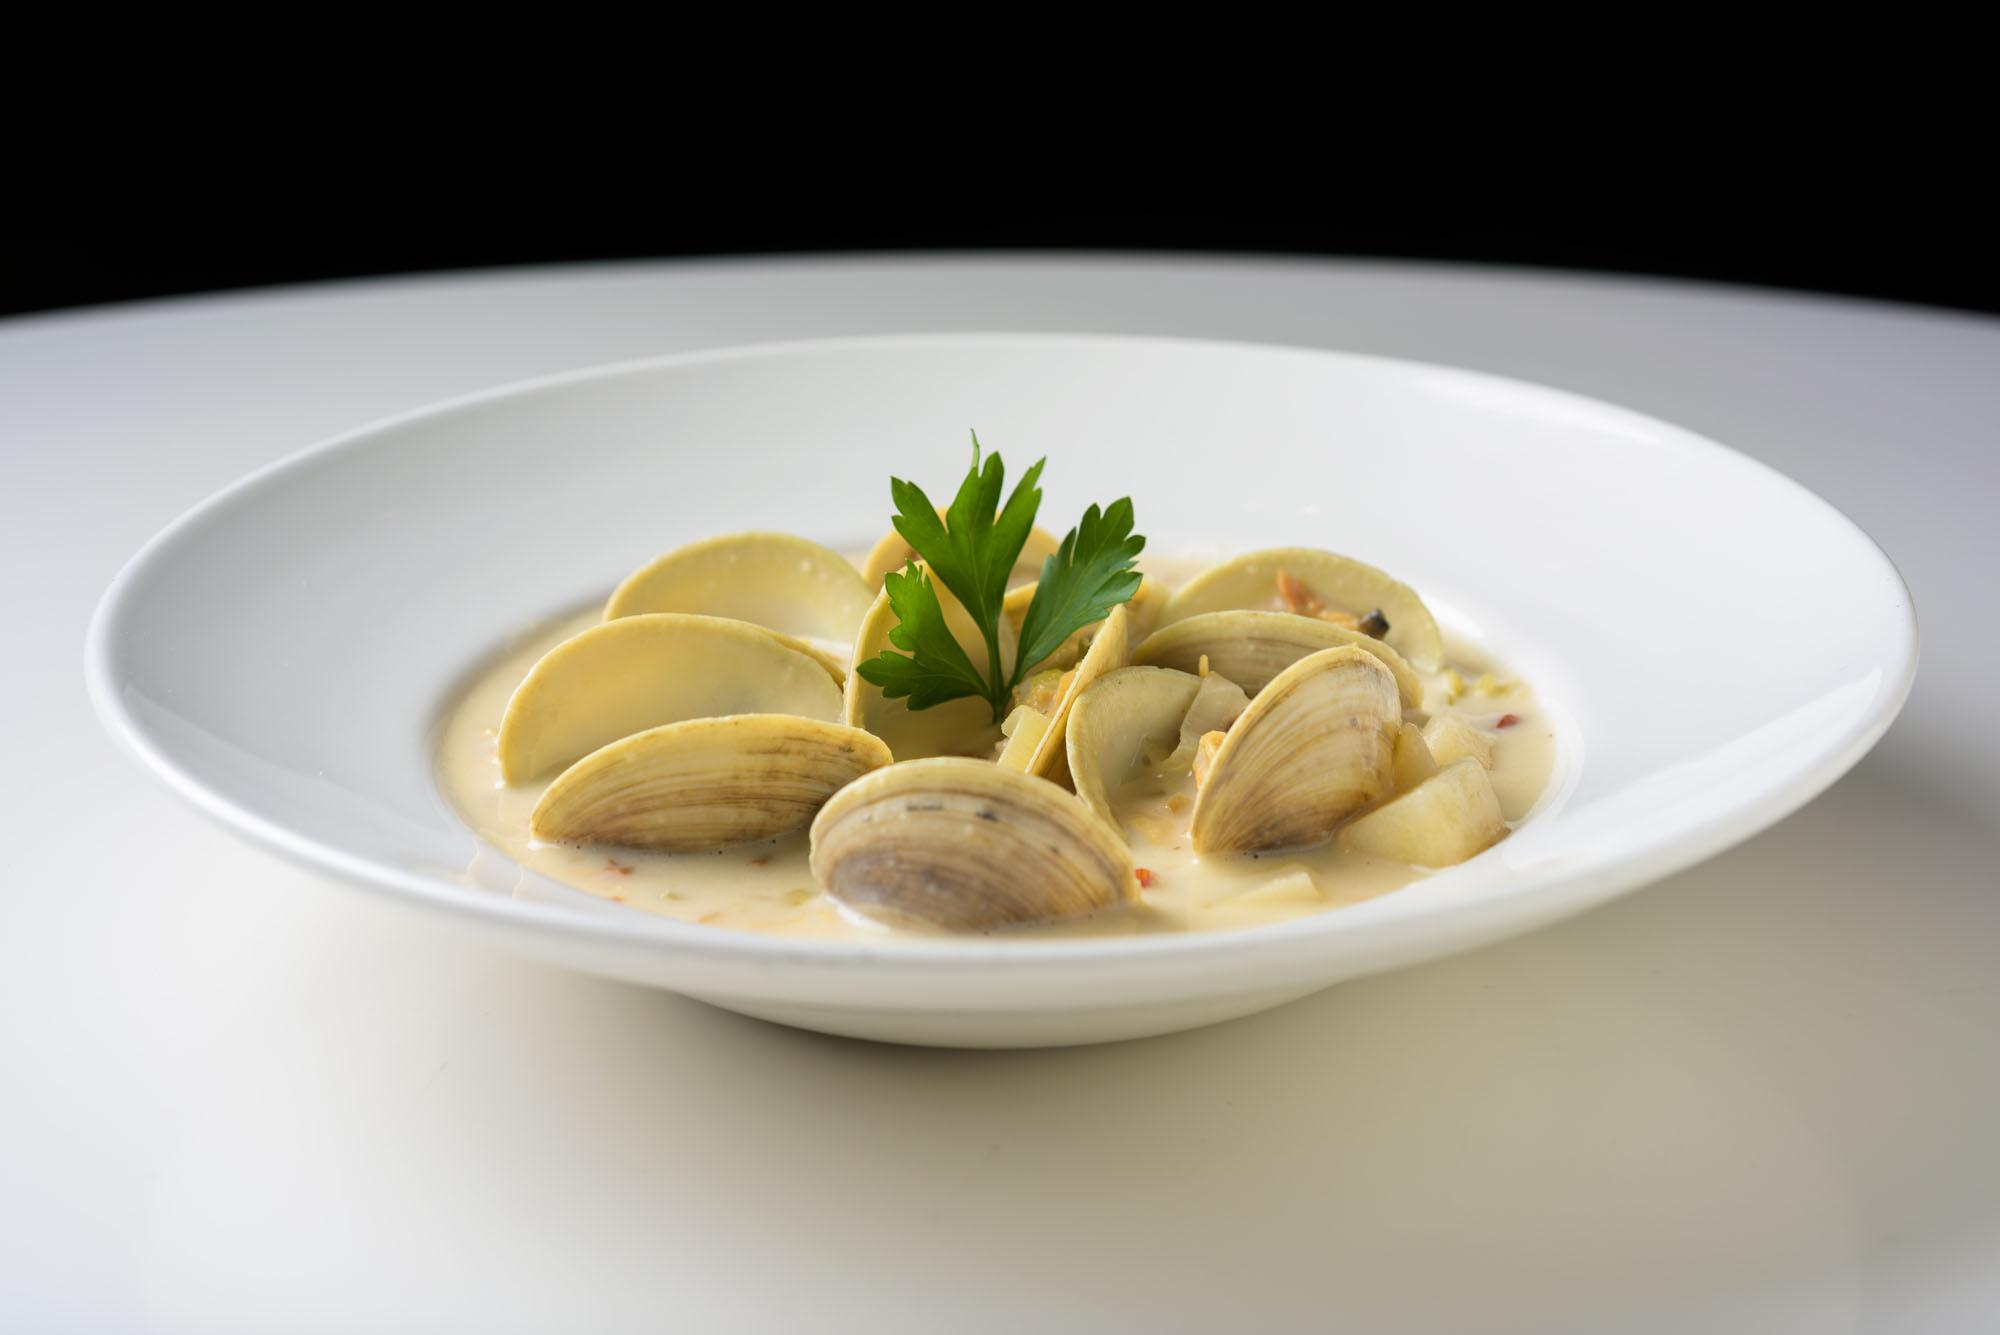 4153_d810a_Solaire_Paradox_Restaurant_Santa_Cruz_Food_Photography.jpg